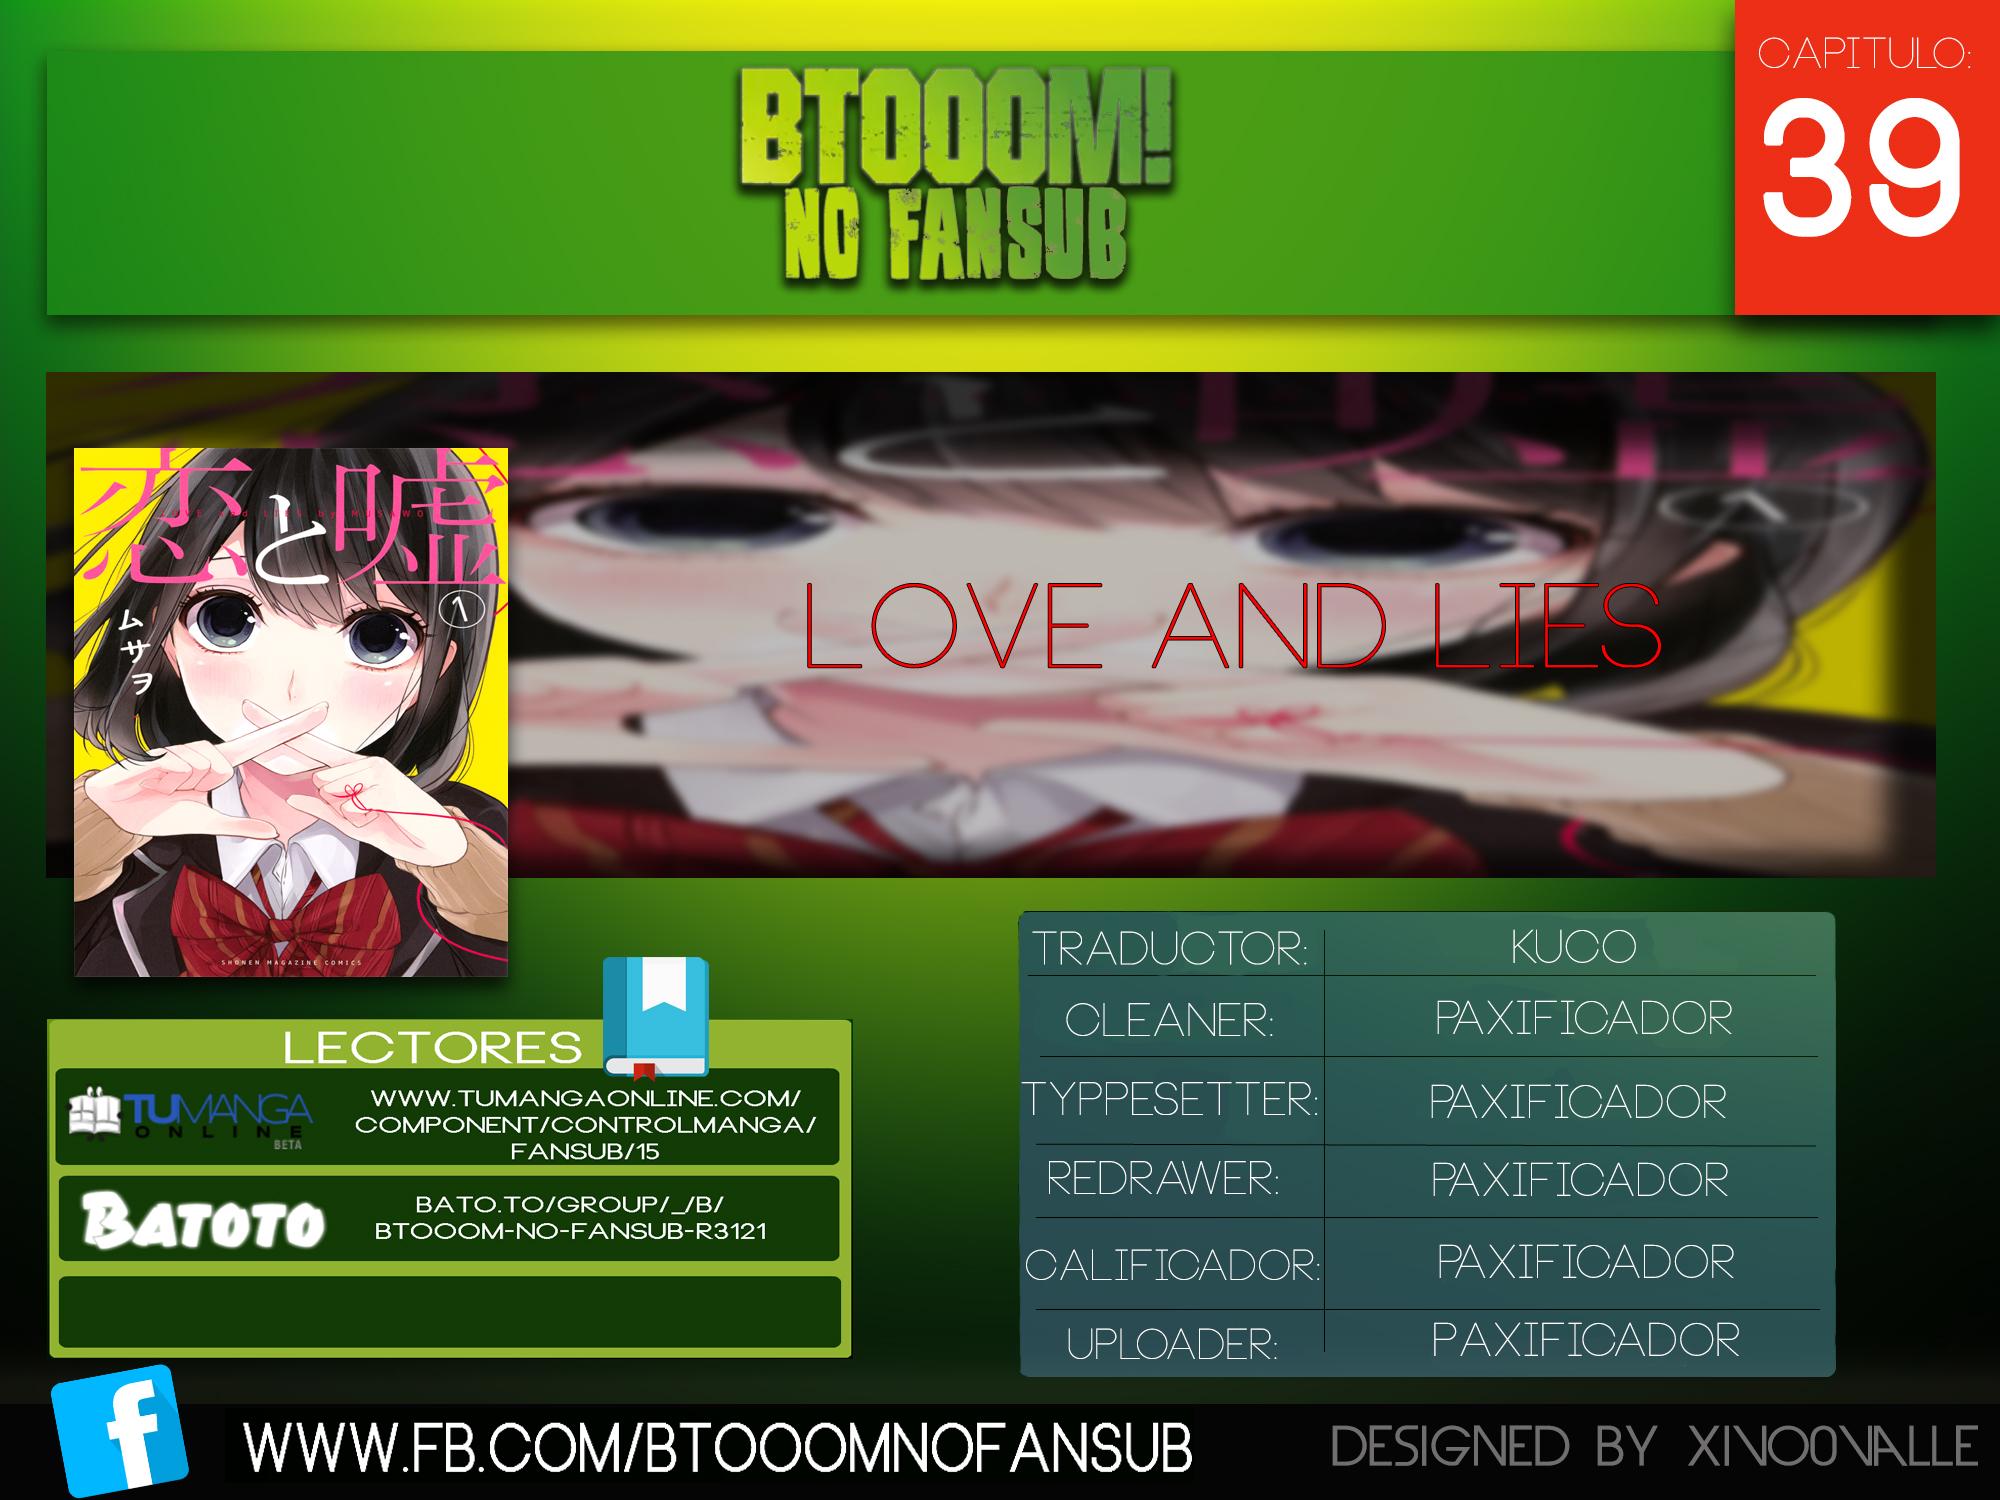 http://c5.ninemanga.com/es_manga/14/14734/383181/2001061d7ff8025aeabbfa078359b49d.jpg Page 1